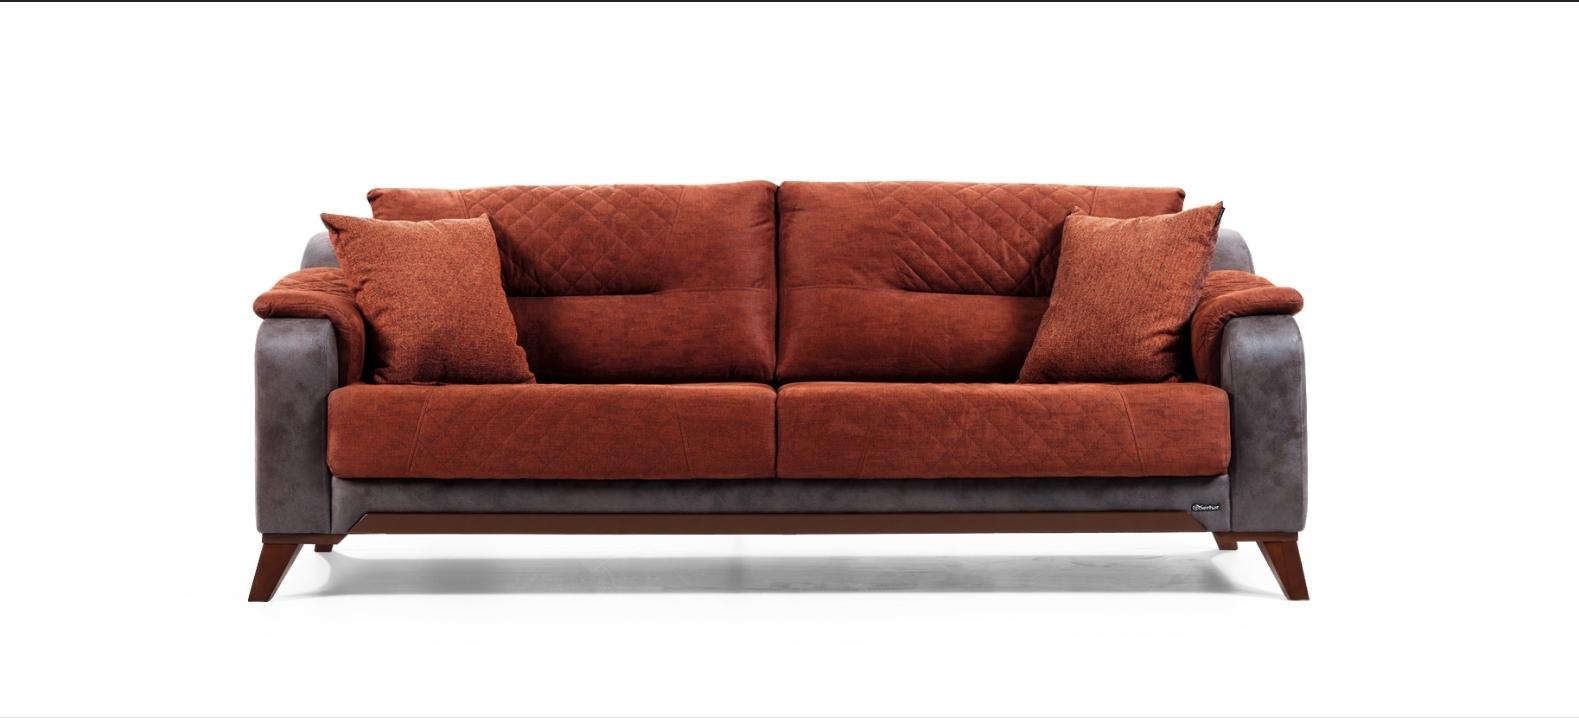 Canapea fixa tapitata 3 locuri Flamenko Caramiziu K2 l218xA96xH84 cm